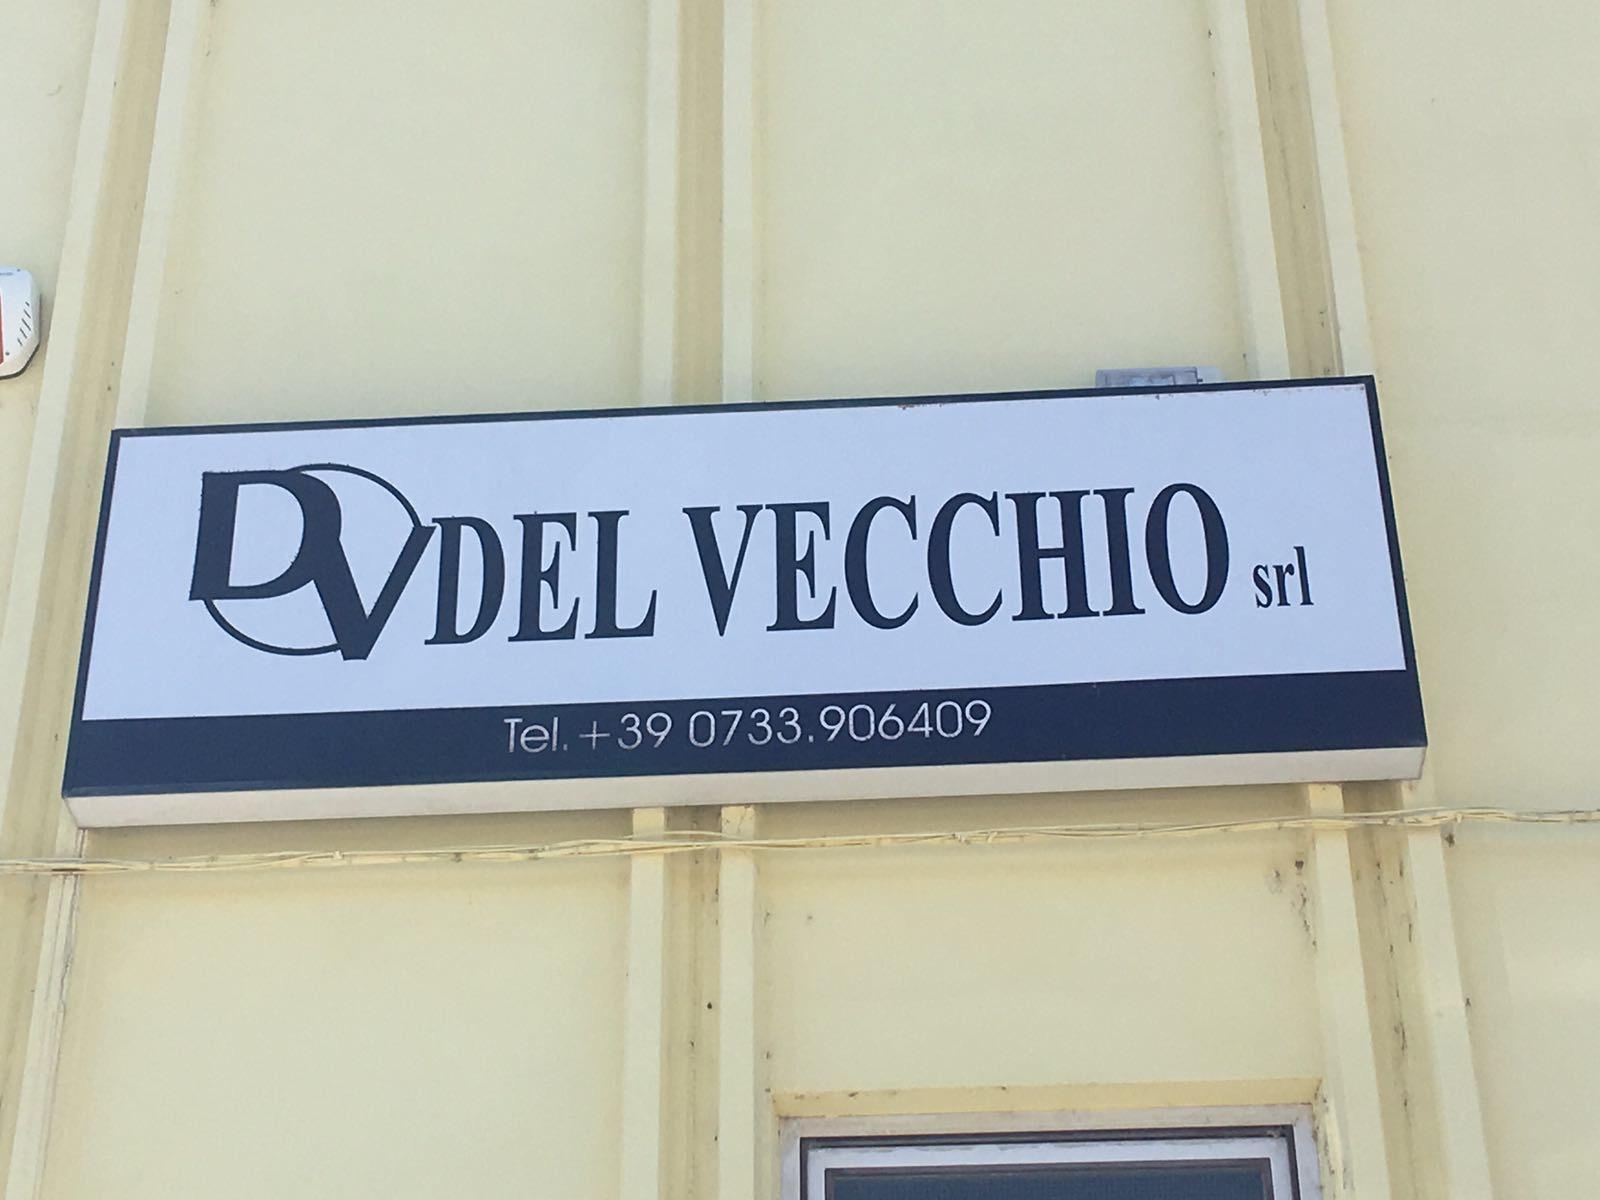 DEL VECCHIO - EDILIZIA - 1